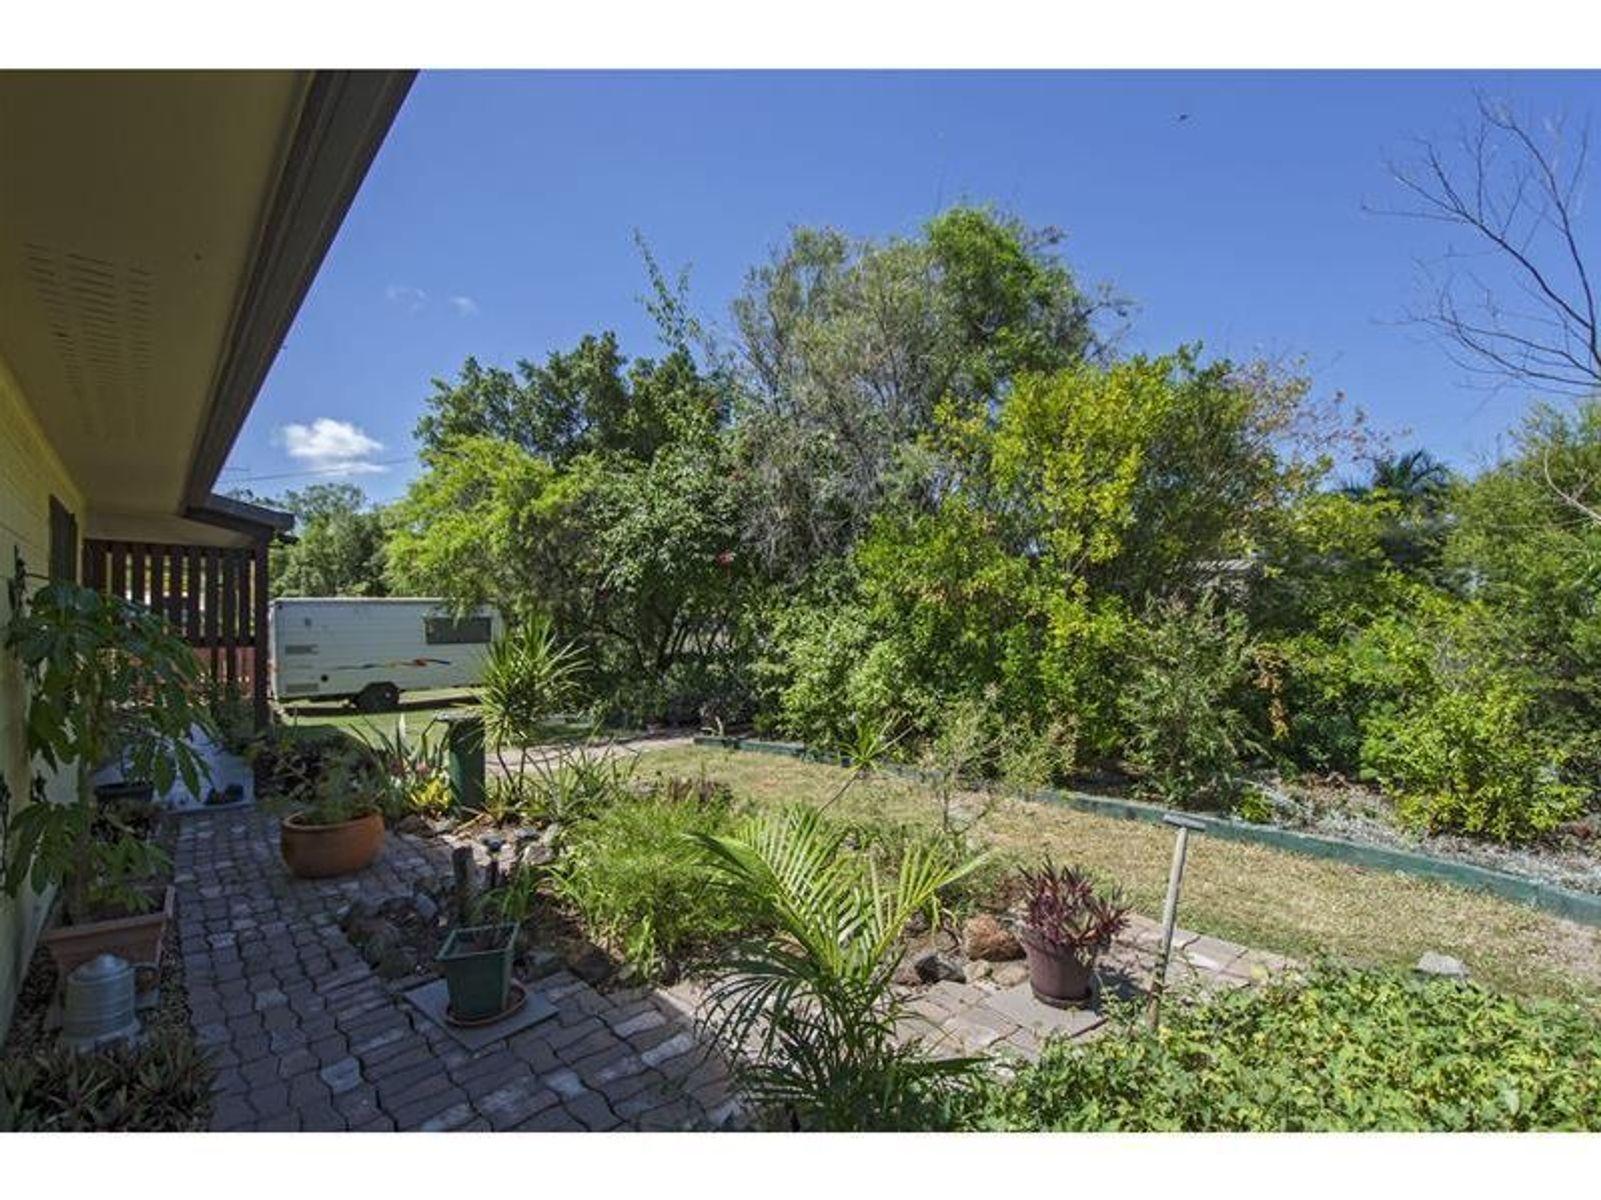 8 Kennedy Street, Avondale, QLD 4670